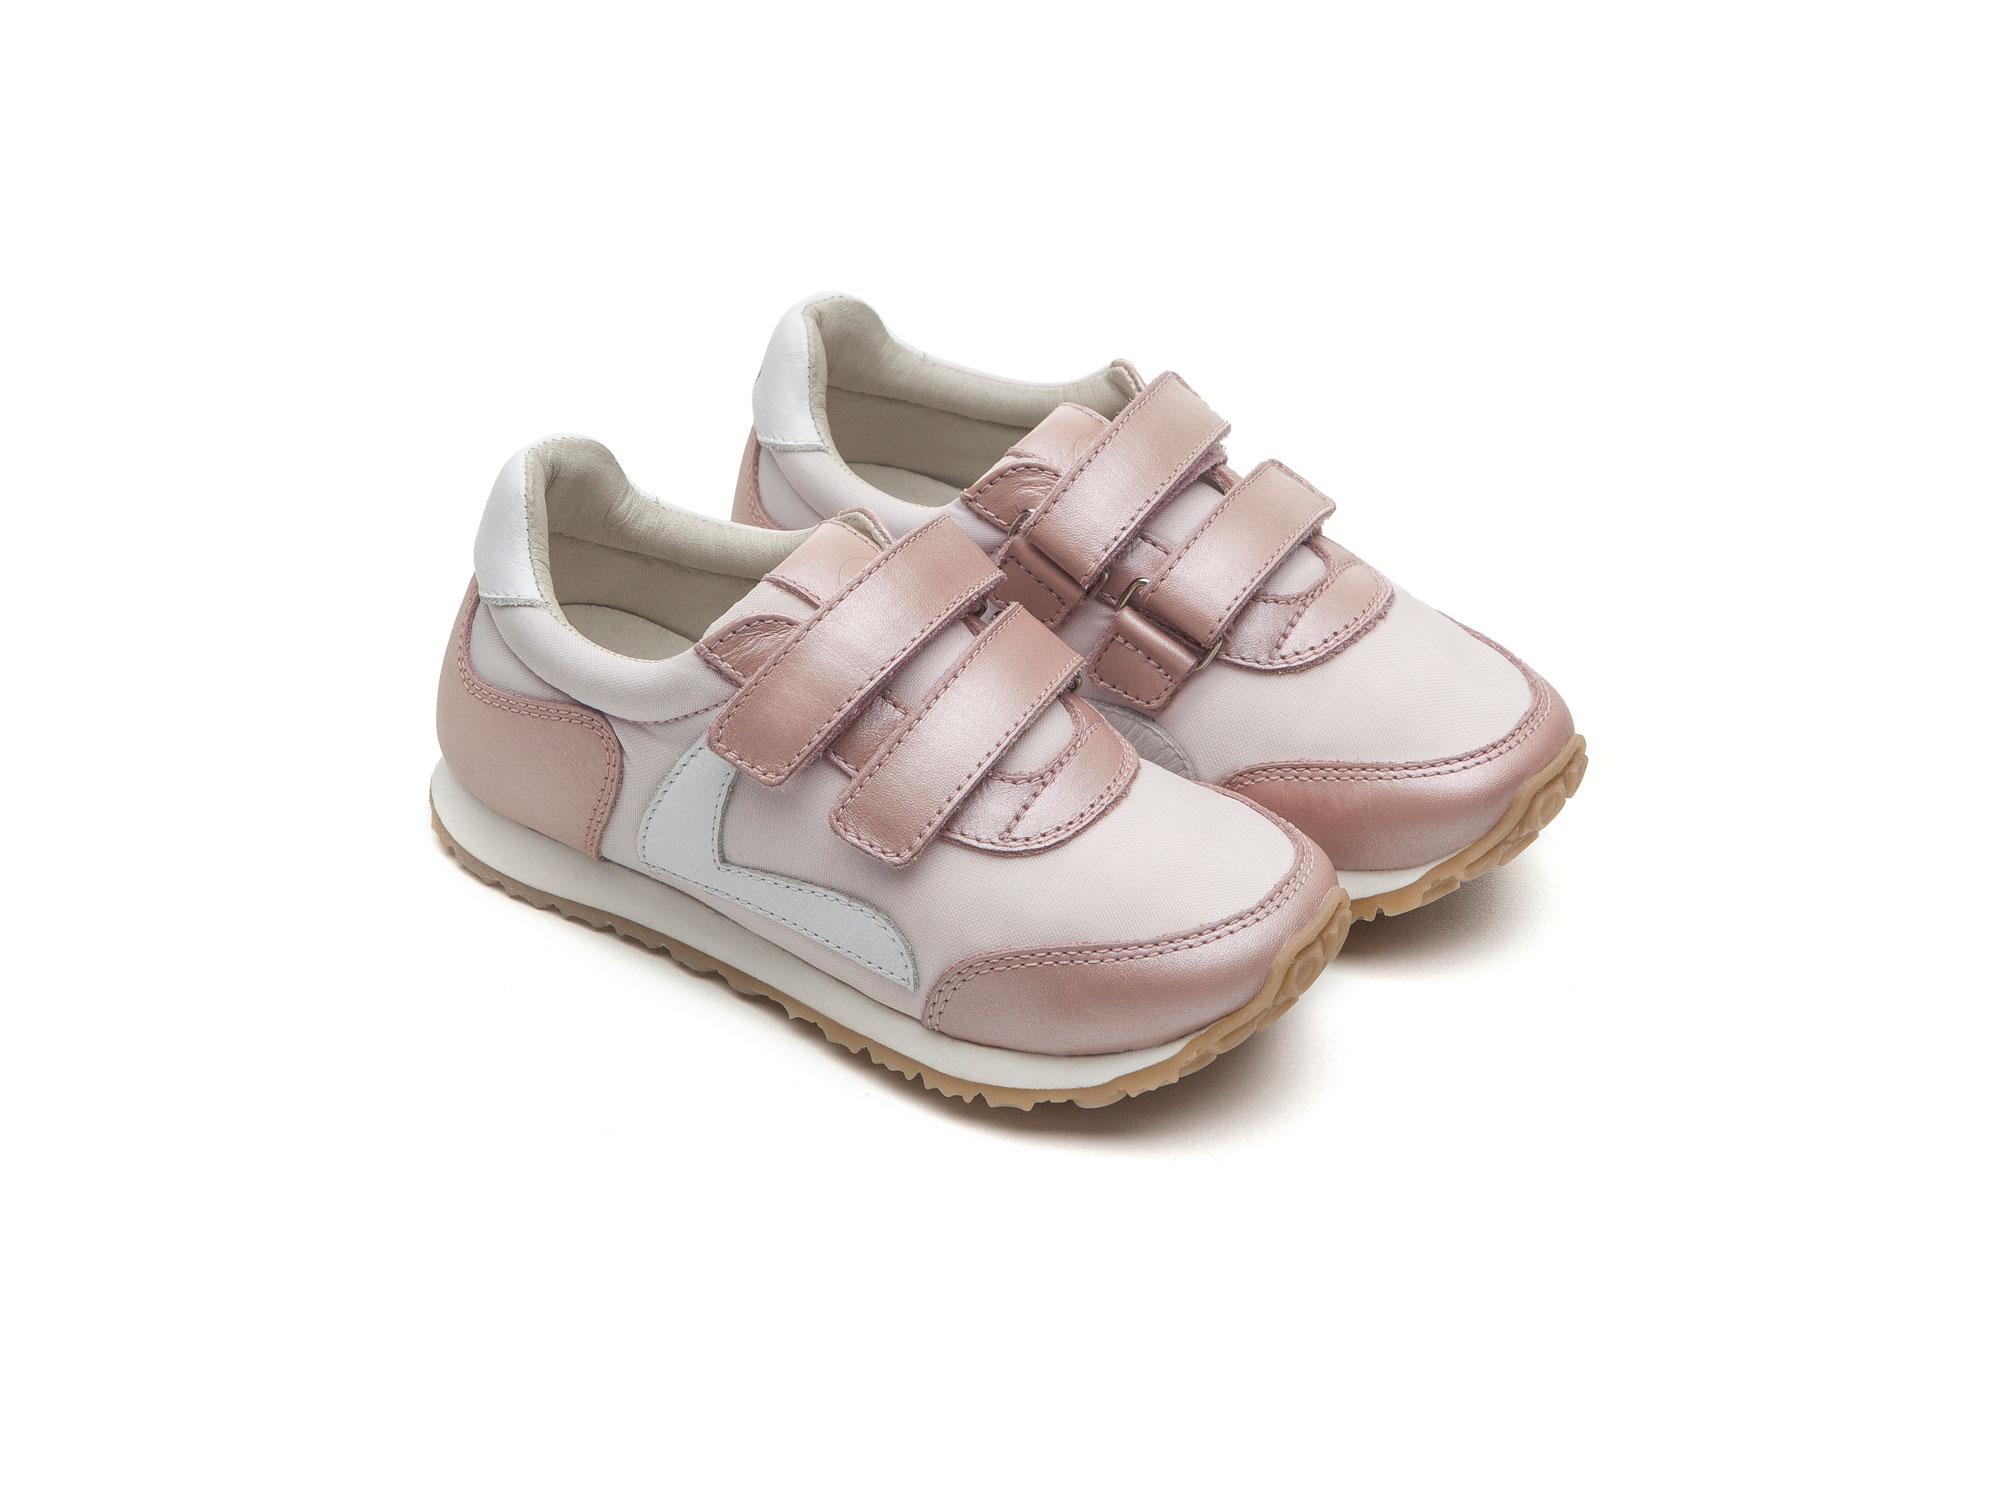 c7b311d5af Tênis Little Jump Light Pink Nylon  Pink Dream Toddler 2 à 4 anos - 0